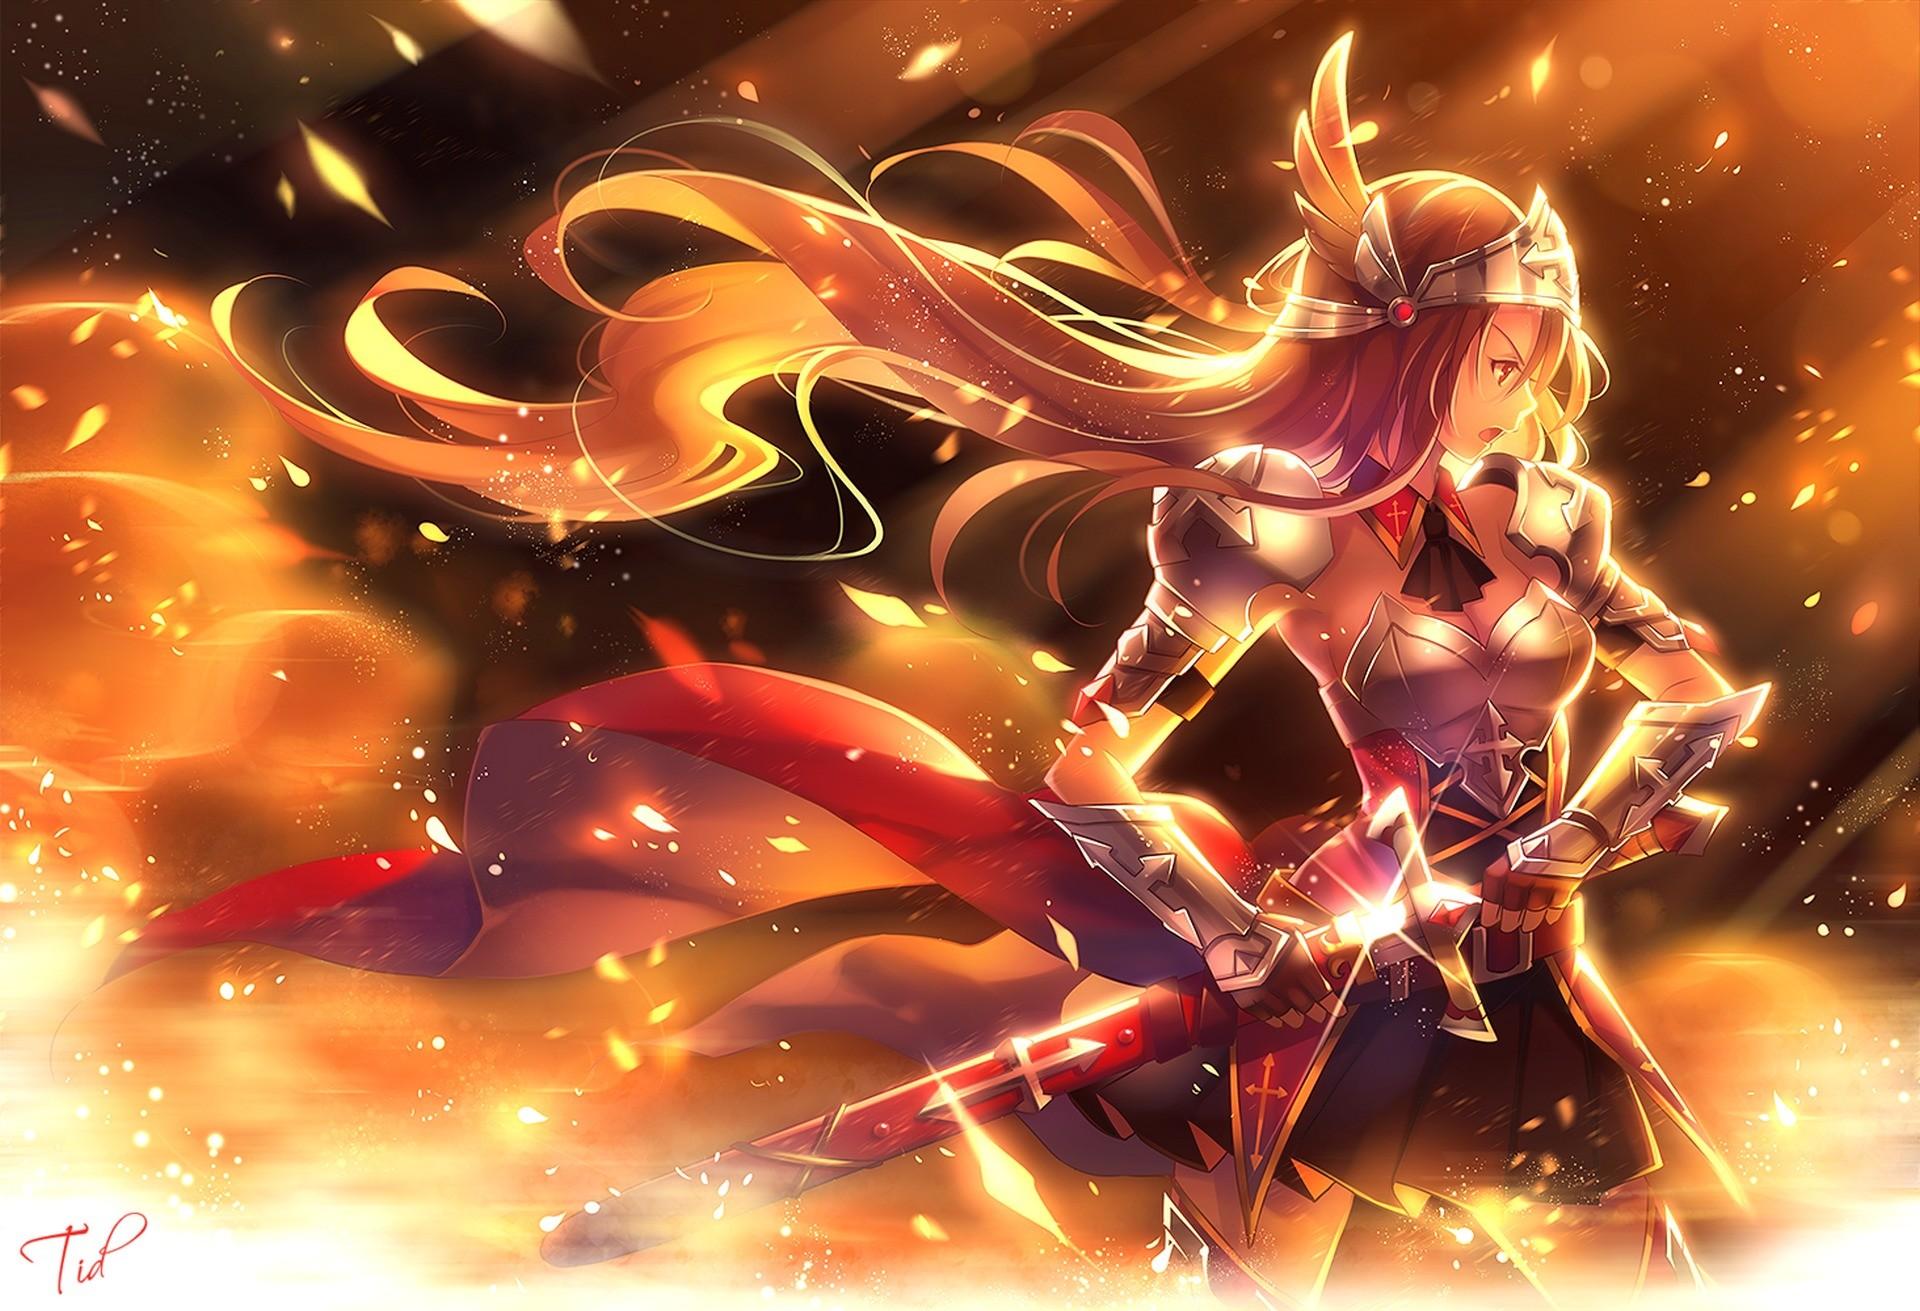 Red hair angel wings fantasy girl sword warrior wallpaper .